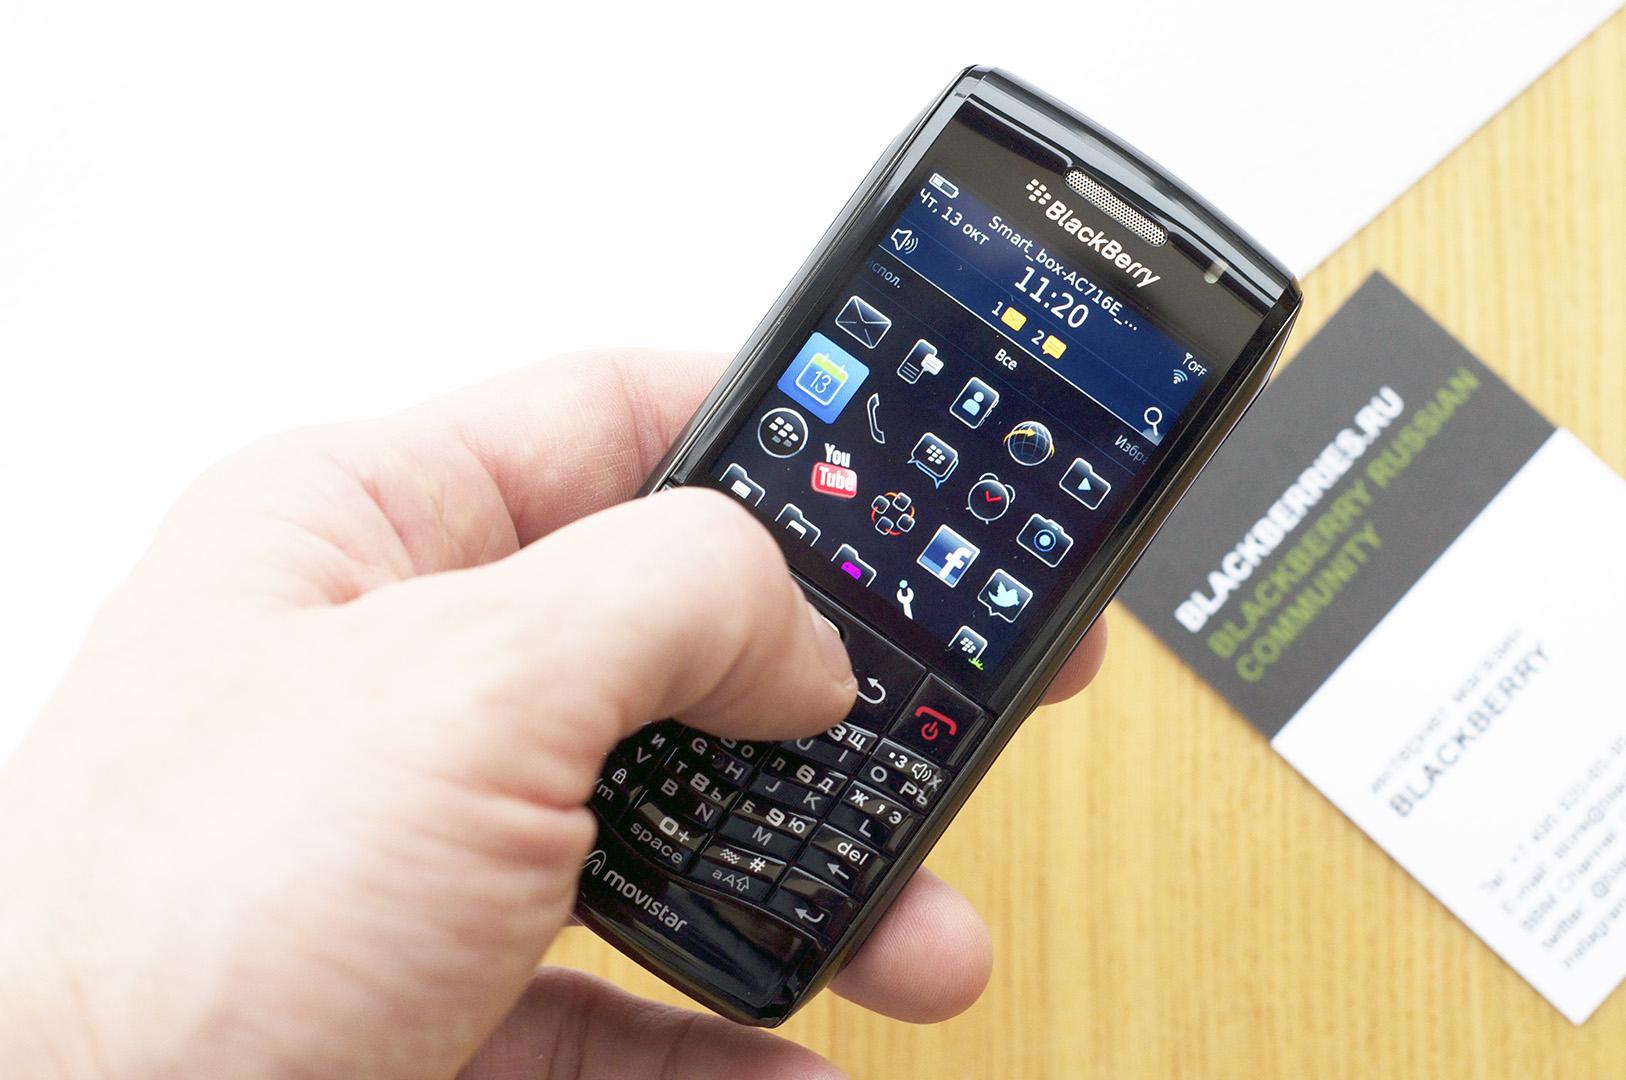 blackberry-9100-pearl-3g-14